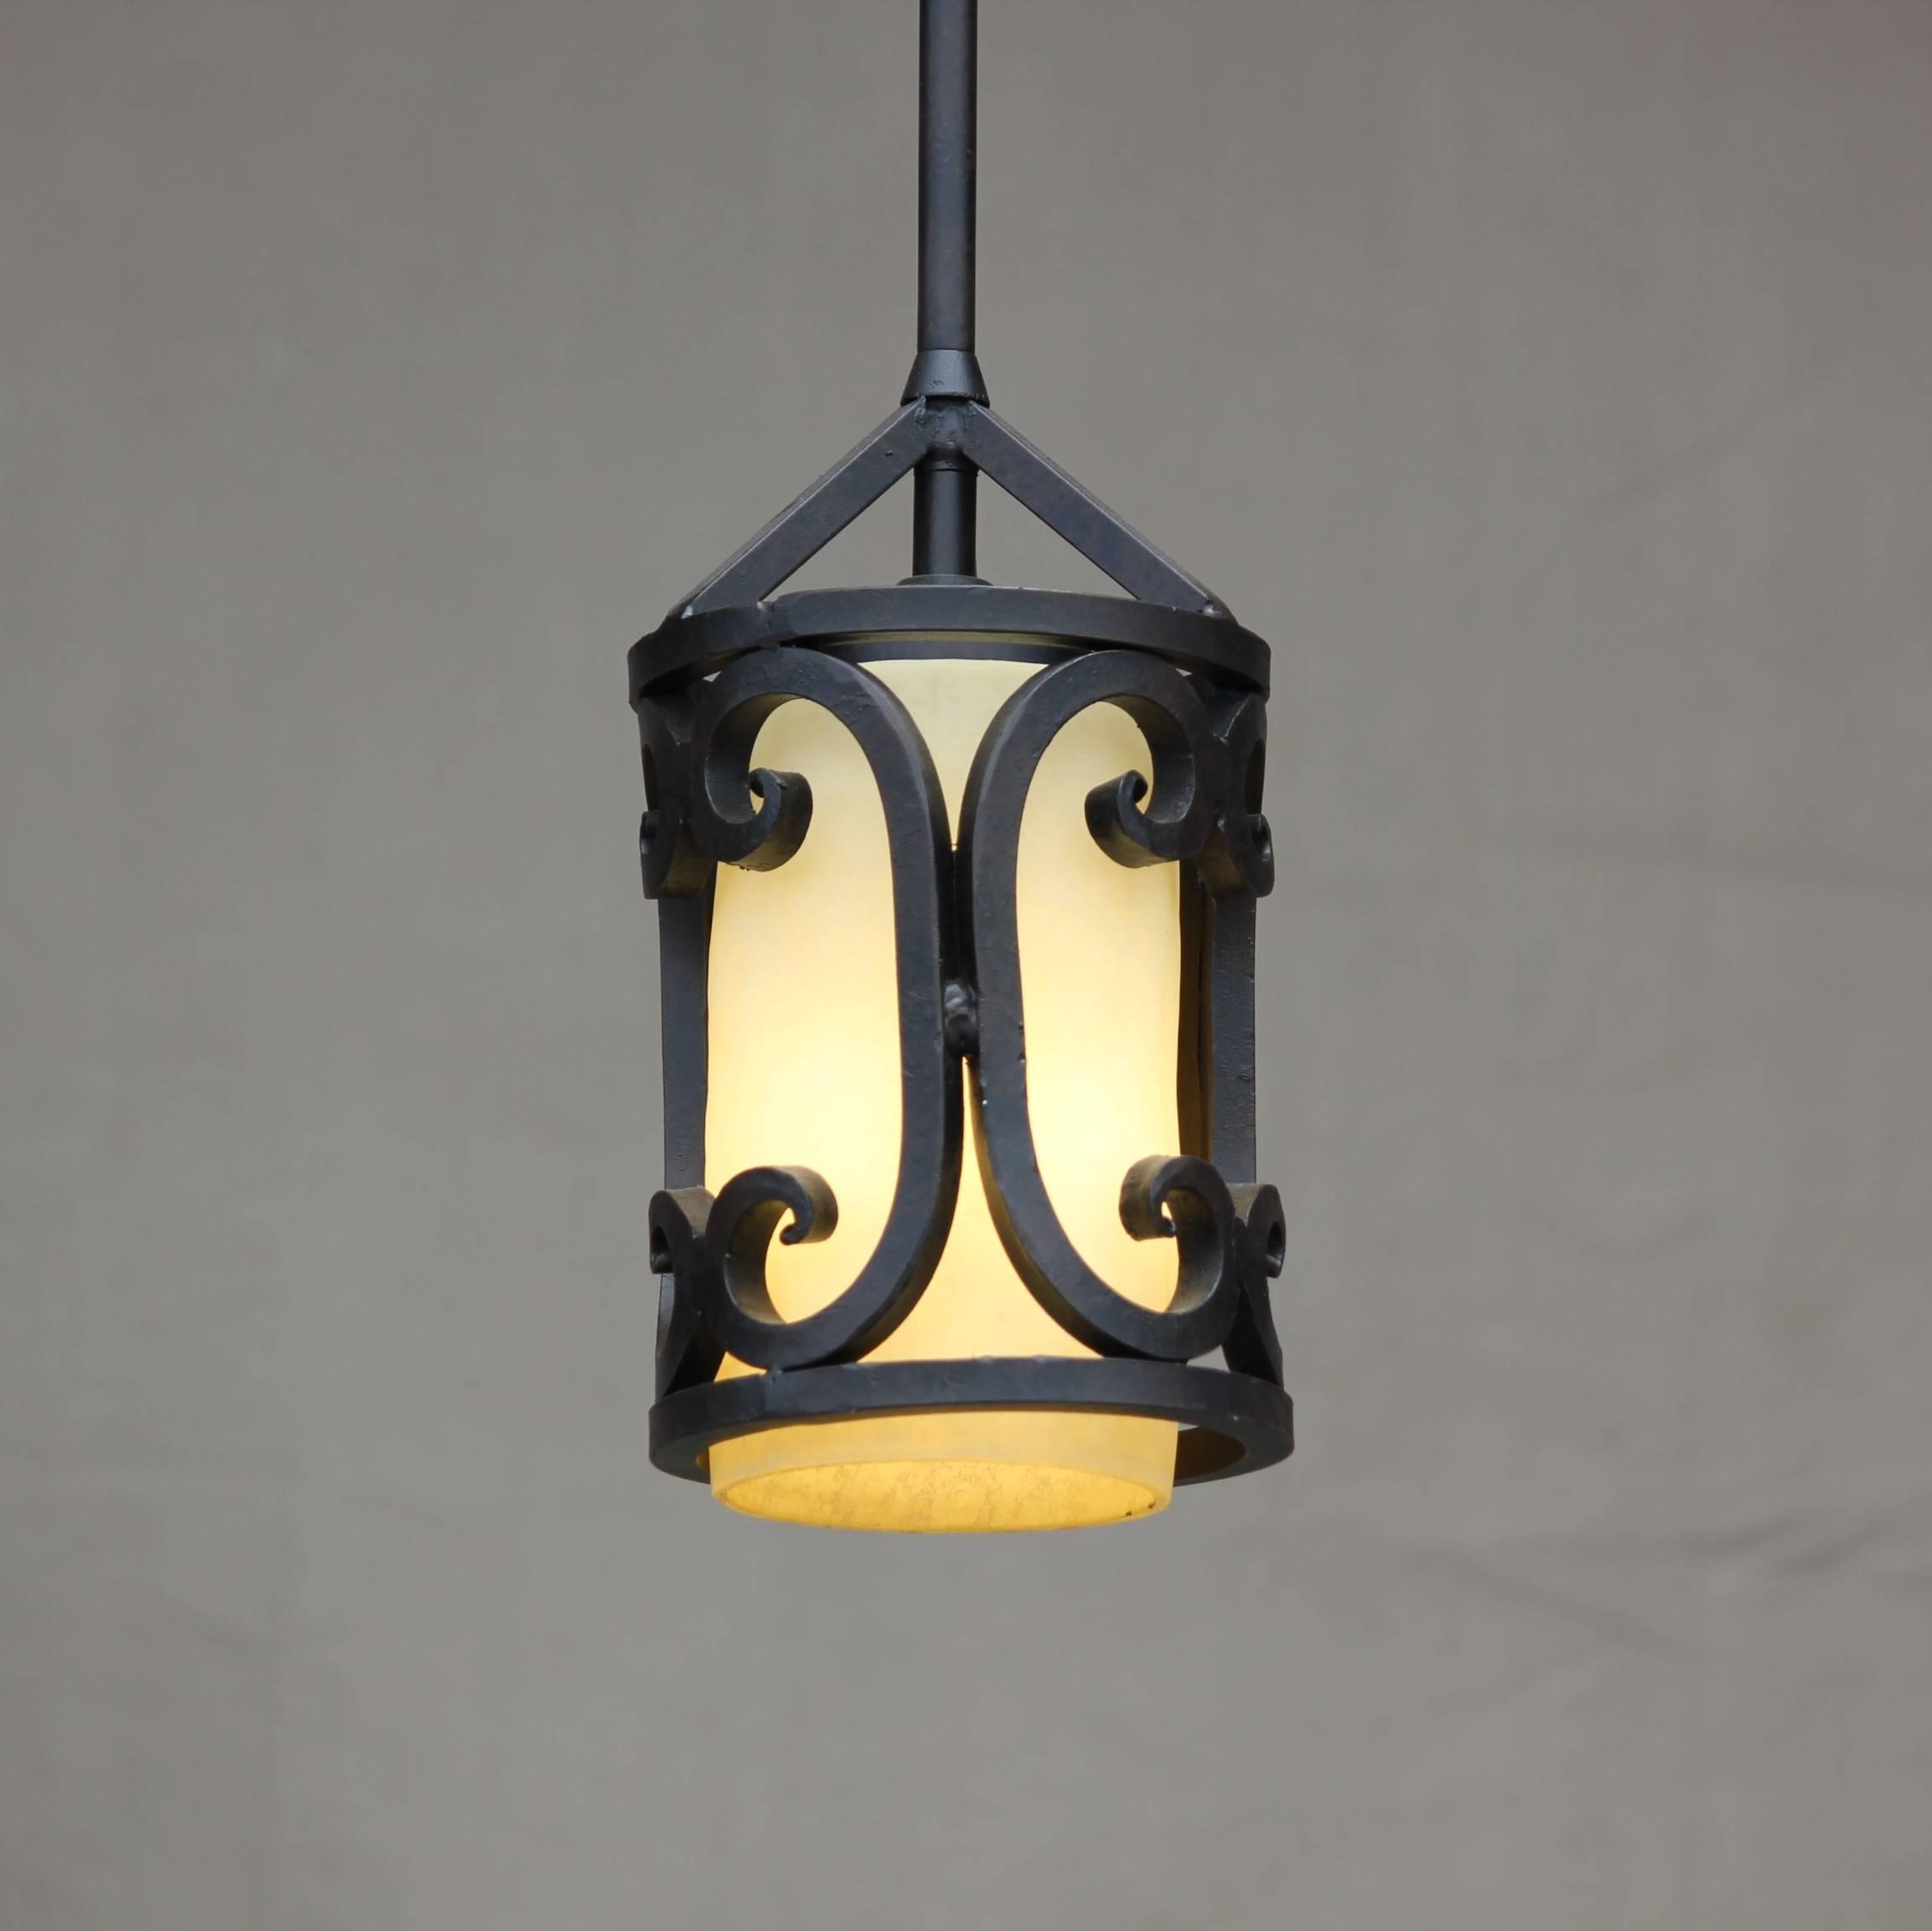 Amazing Of Wrought Iron Pendant Light Related To House Decor in Wrought Iron Pendant Lights for Kitchen (Image 2 of 15)